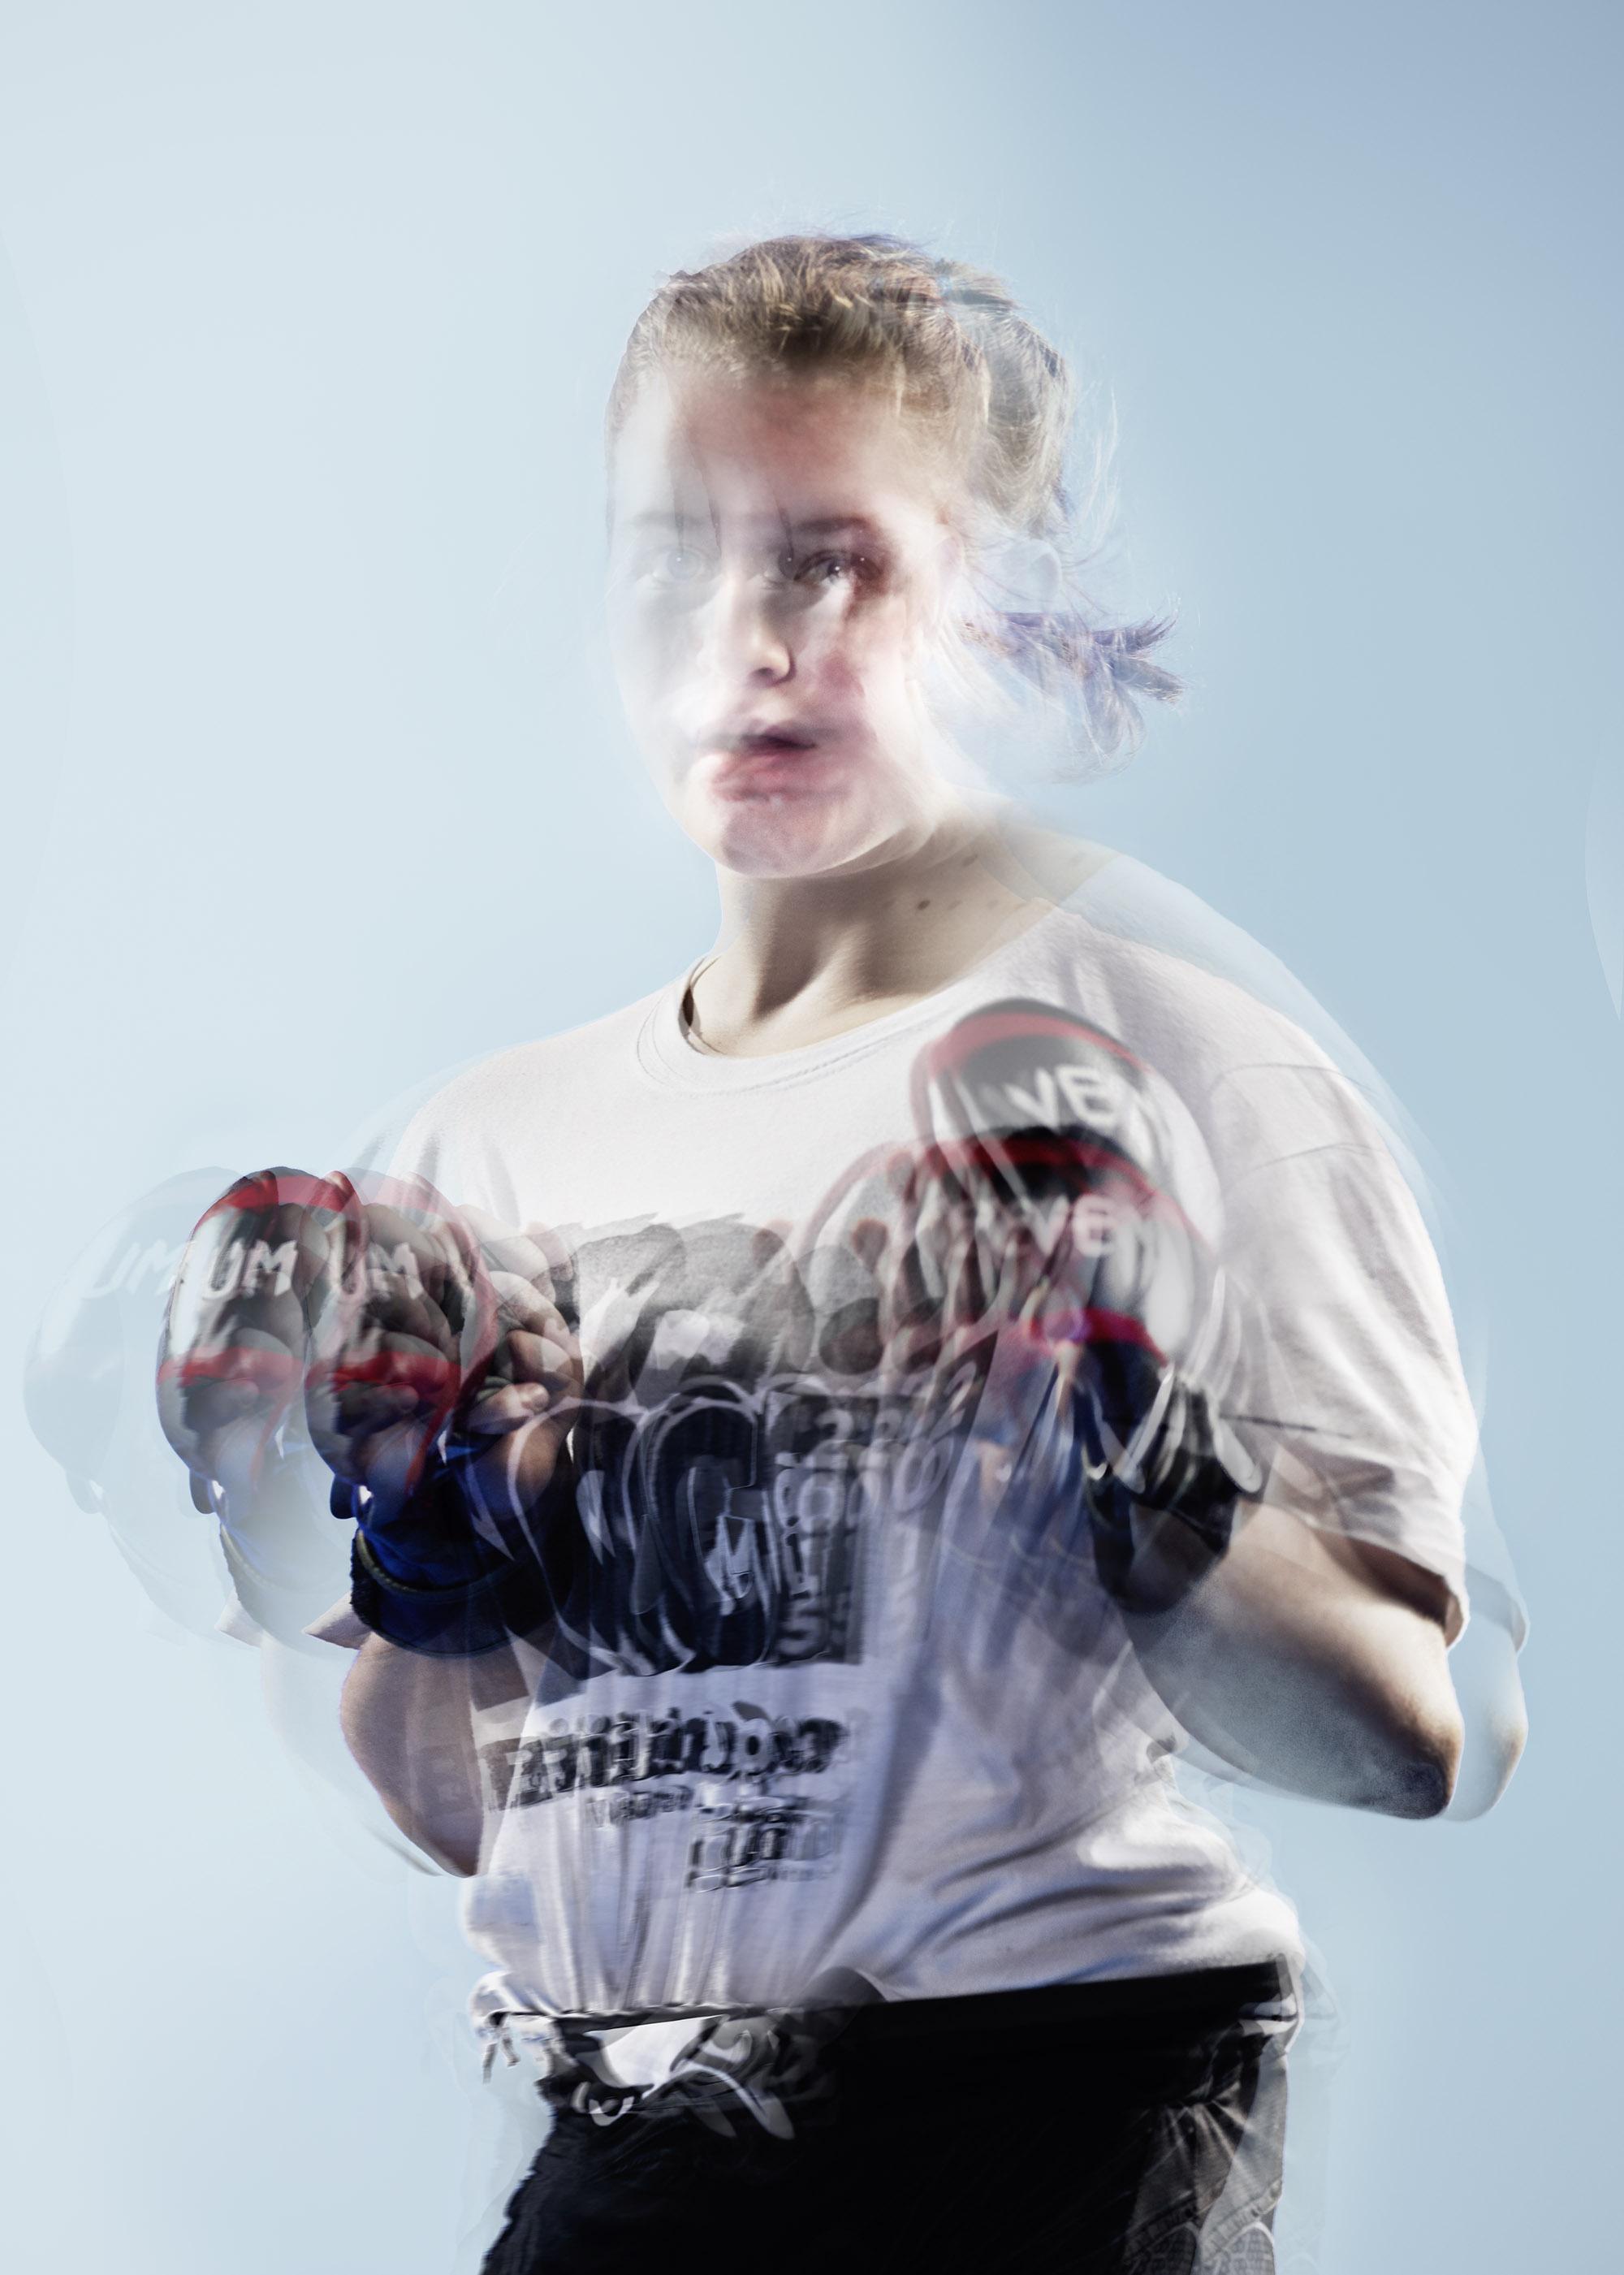 Cage Warriors straw weight phenom Cory McKenna